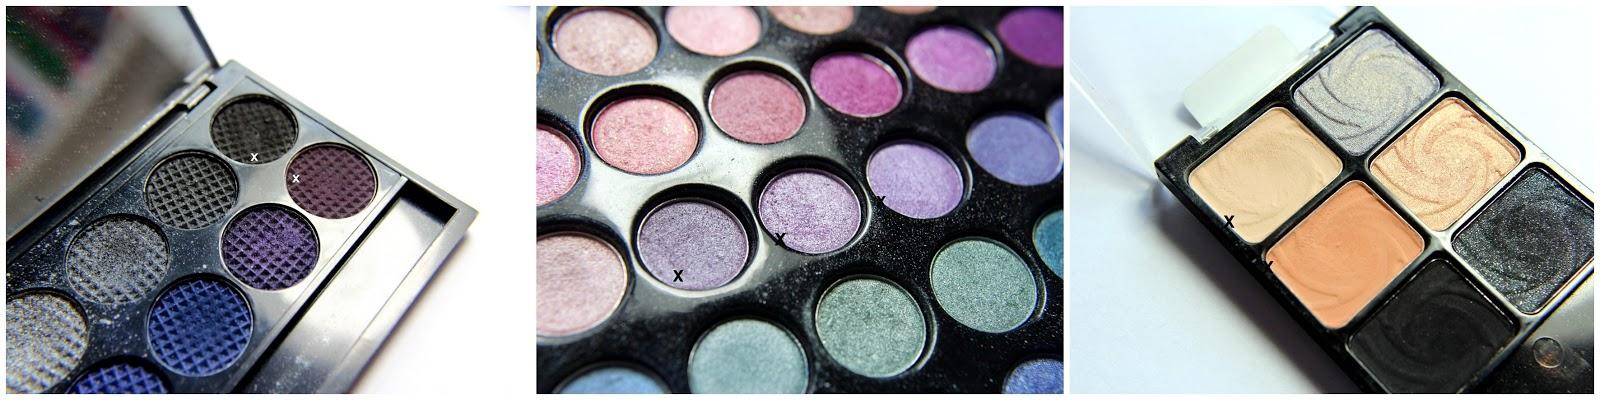 amu purple smokey eyes blush affair. Black Bedroom Furniture Sets. Home Design Ideas